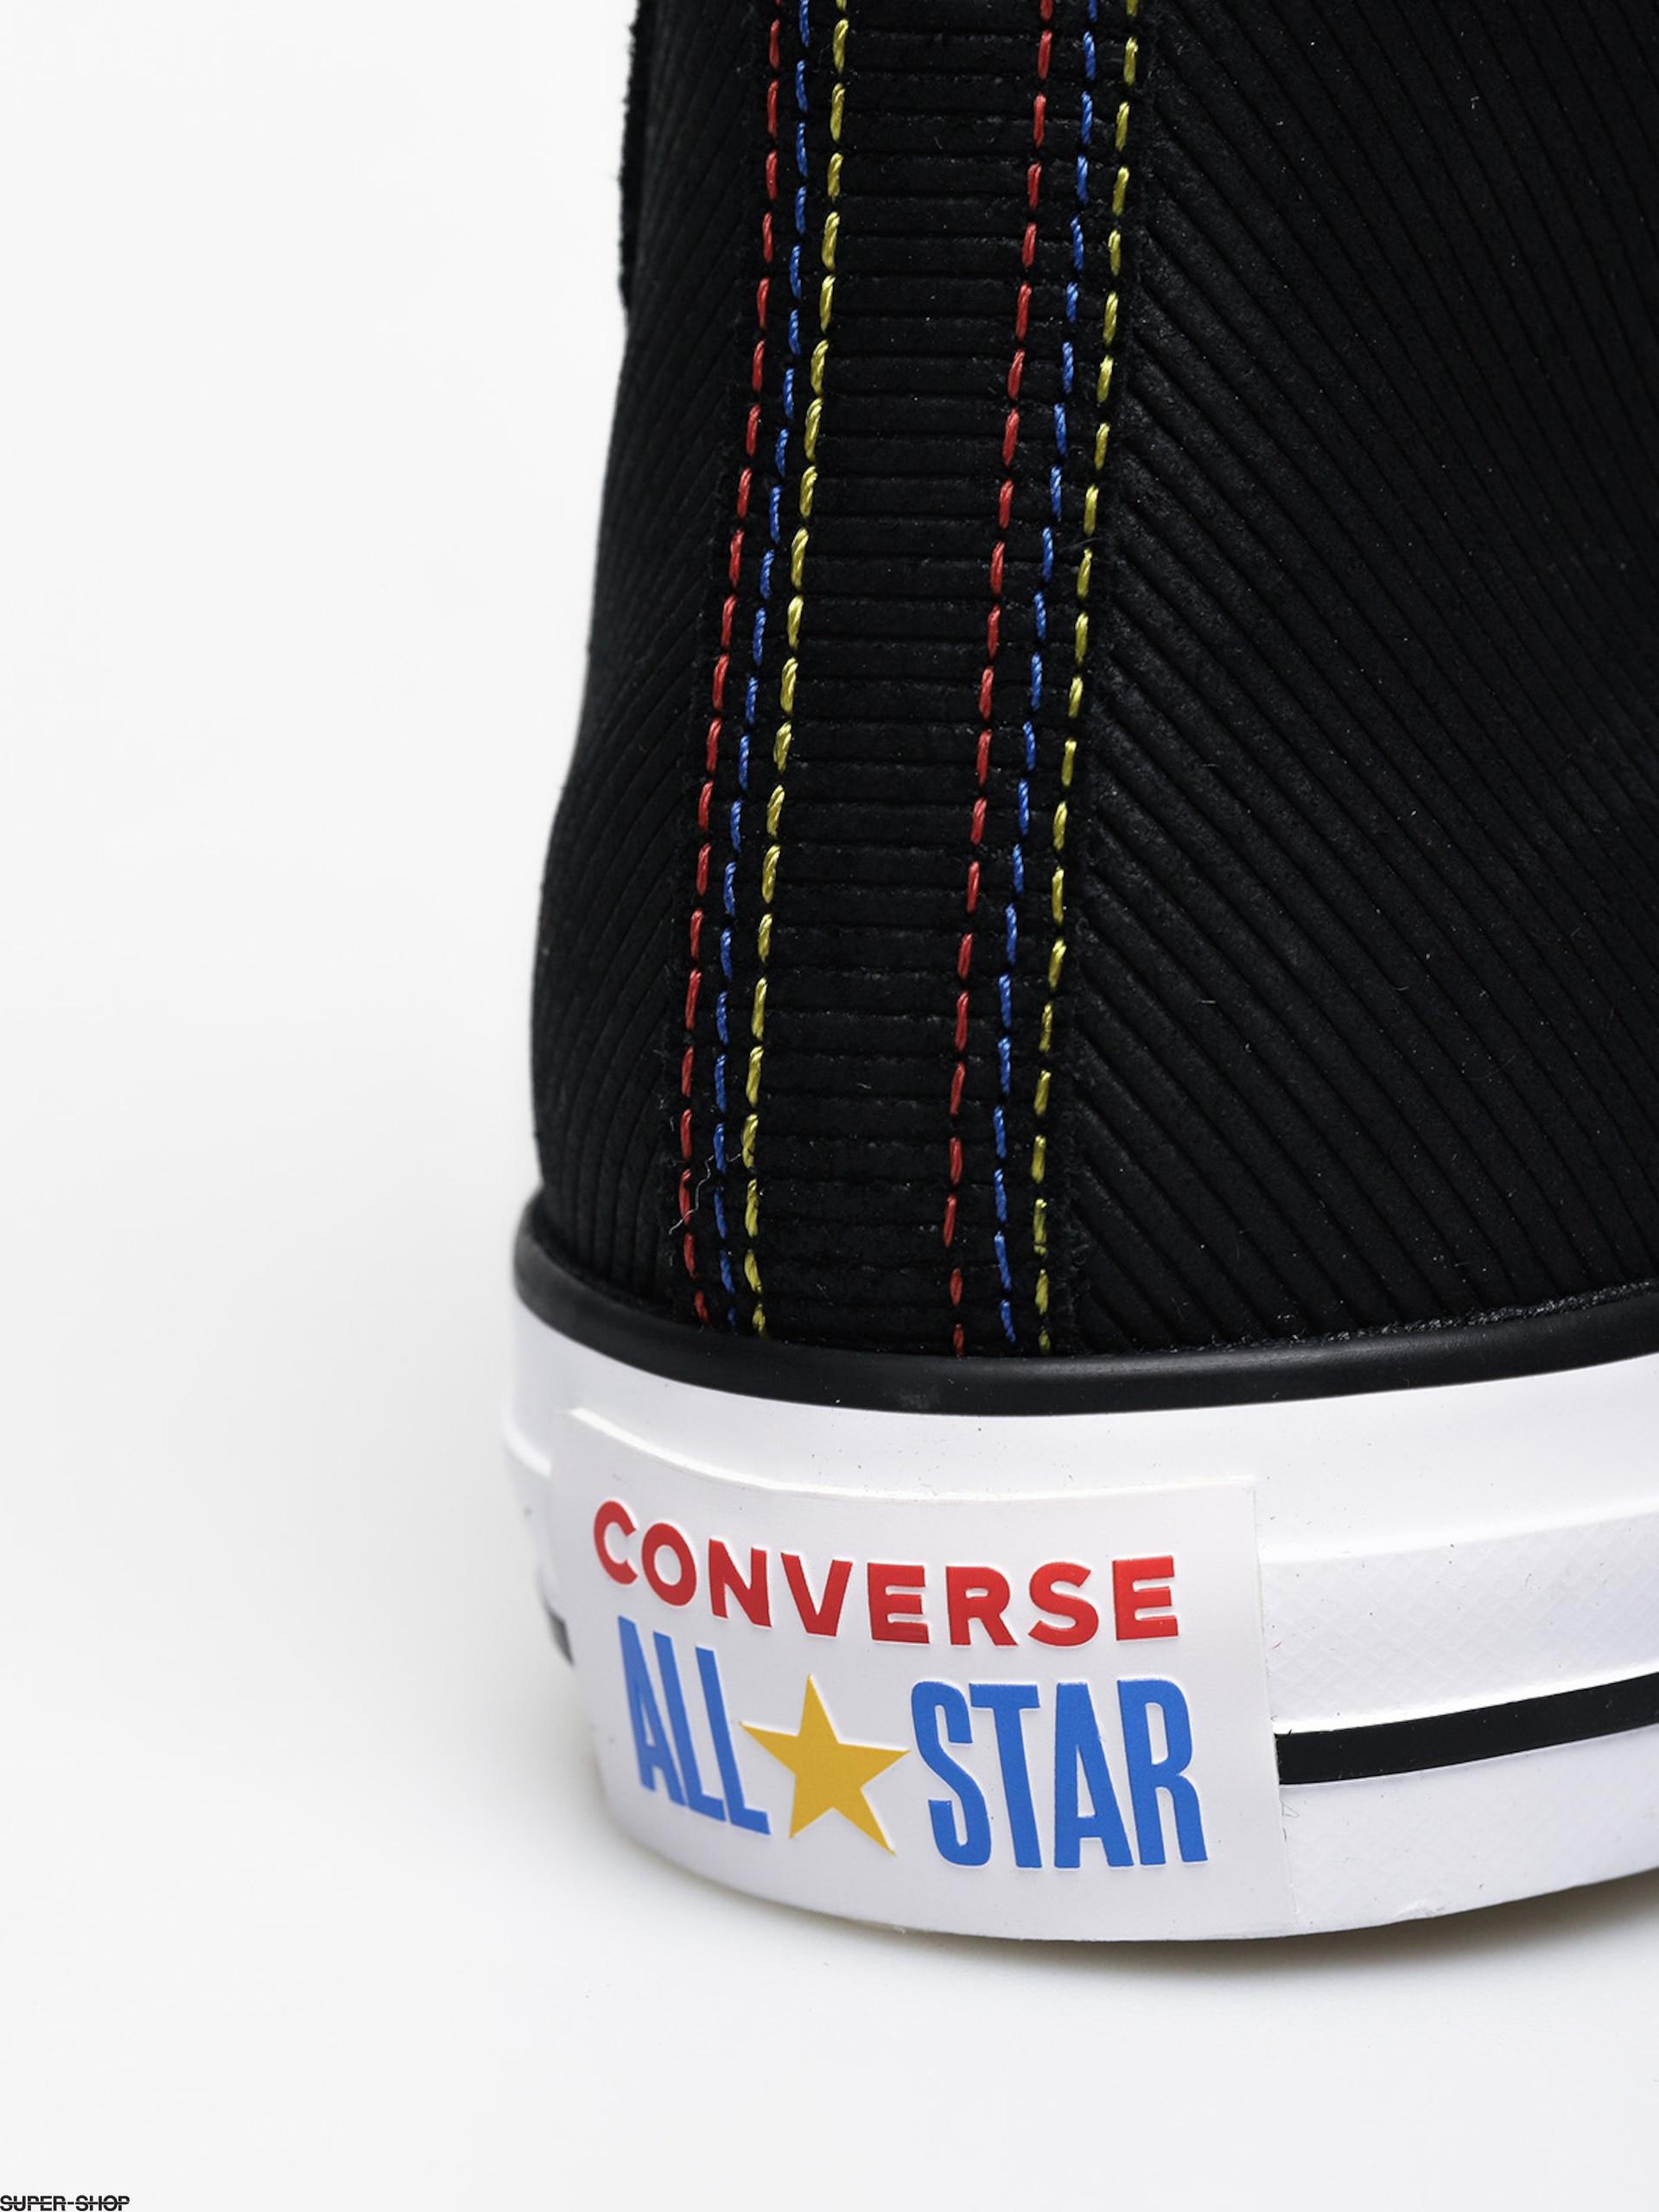 converse all star hi nere